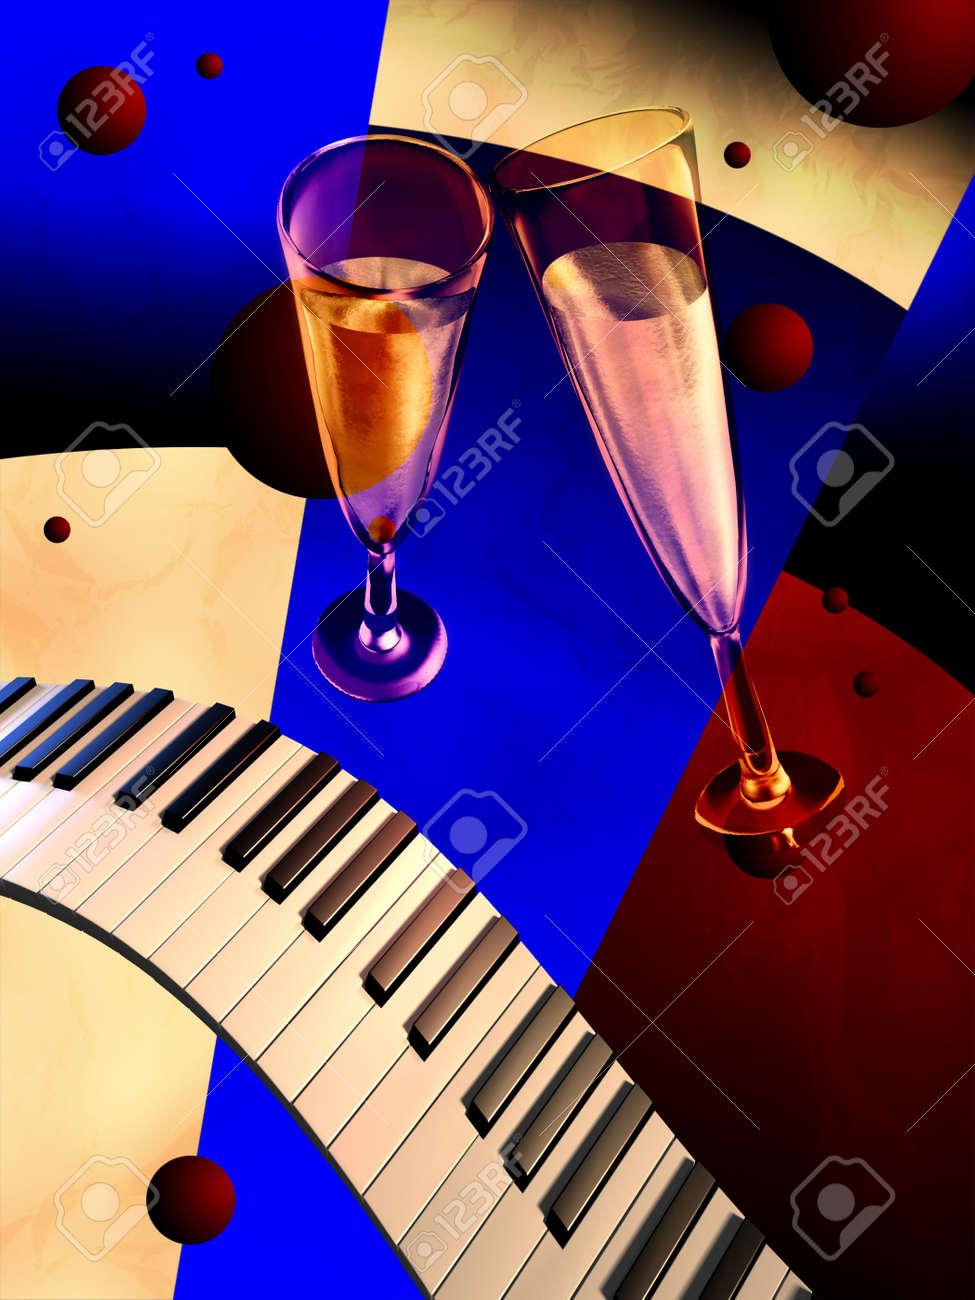 Piano keyboards, glasses and art dec� background. Digital illustration. Stock Illustration - 2972542